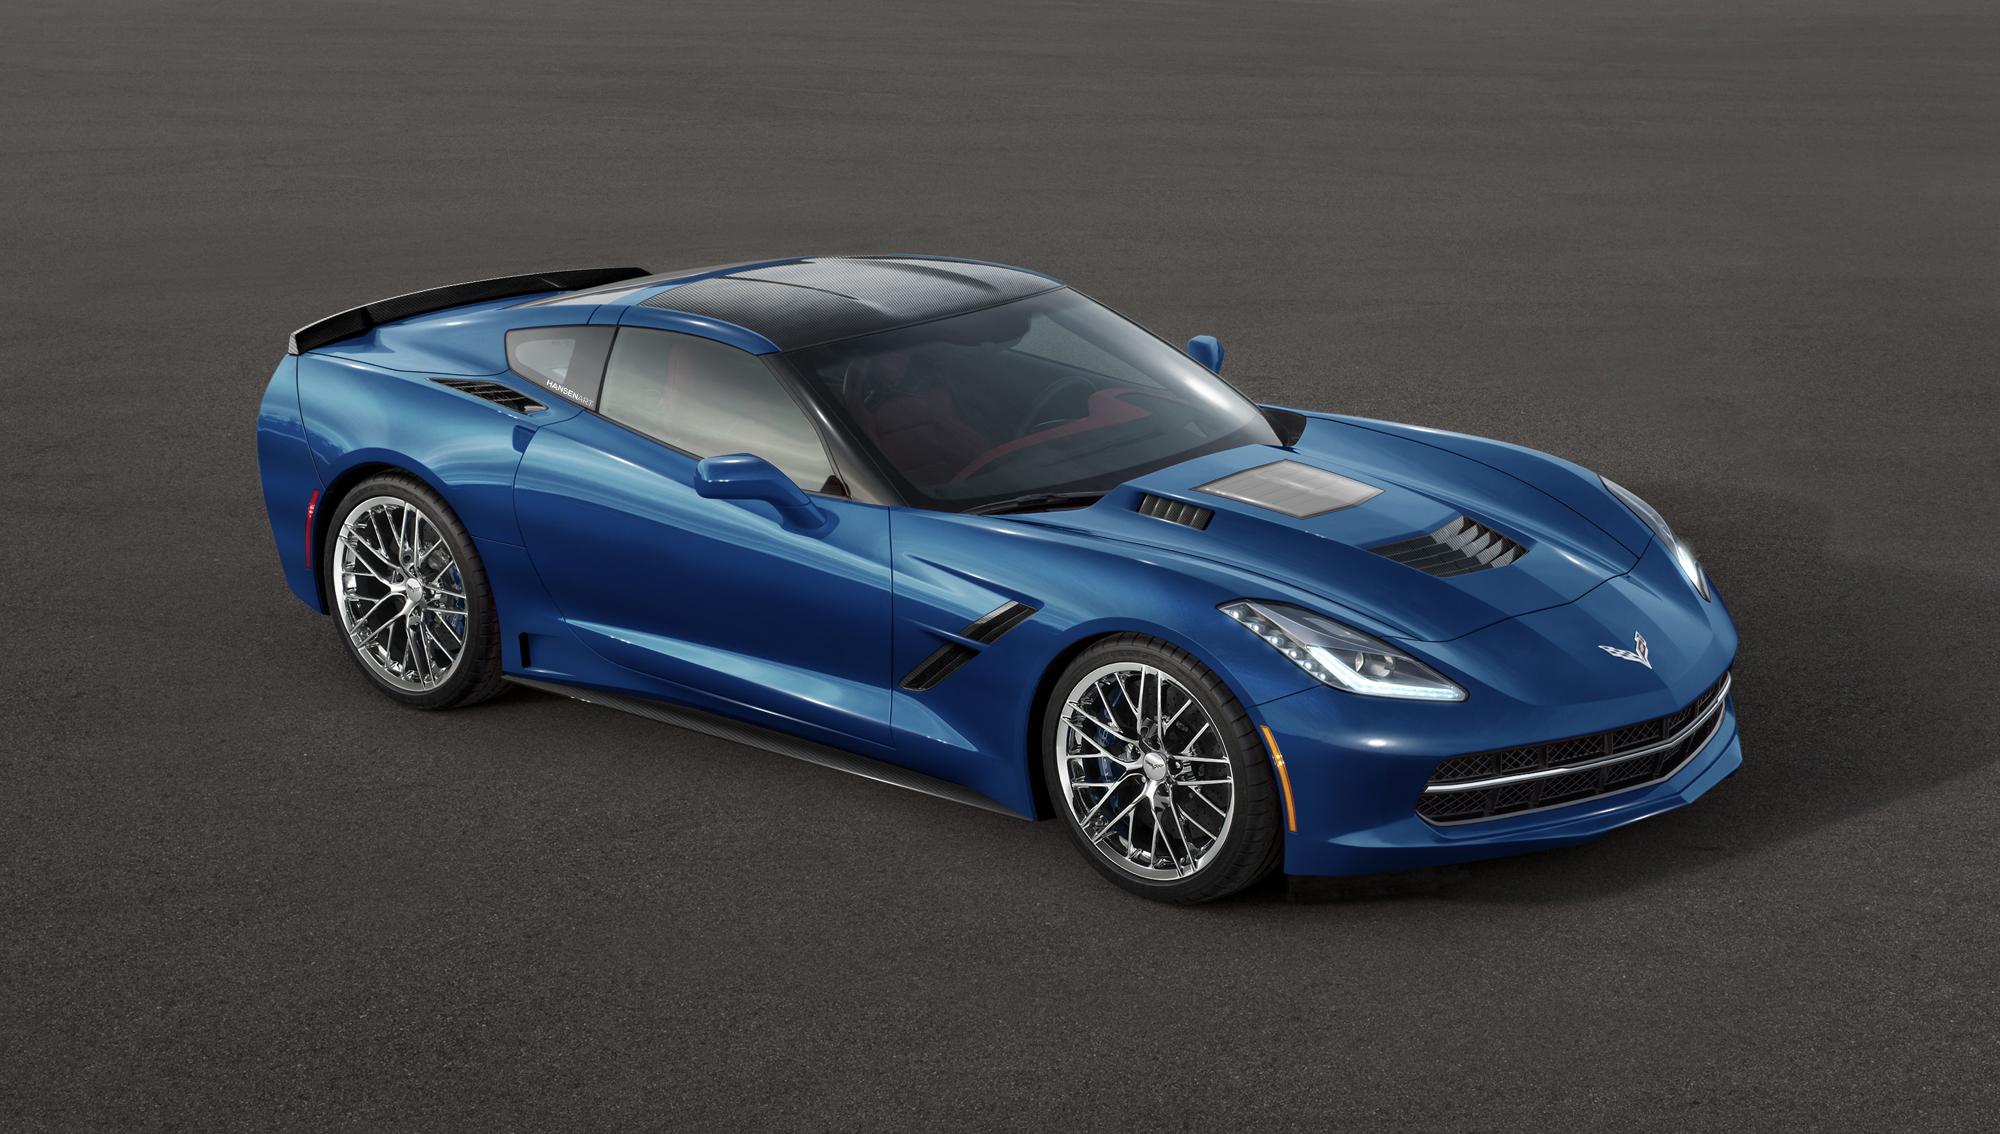 2015 Corvette ZR1 Speculative renders - VirtuaMods